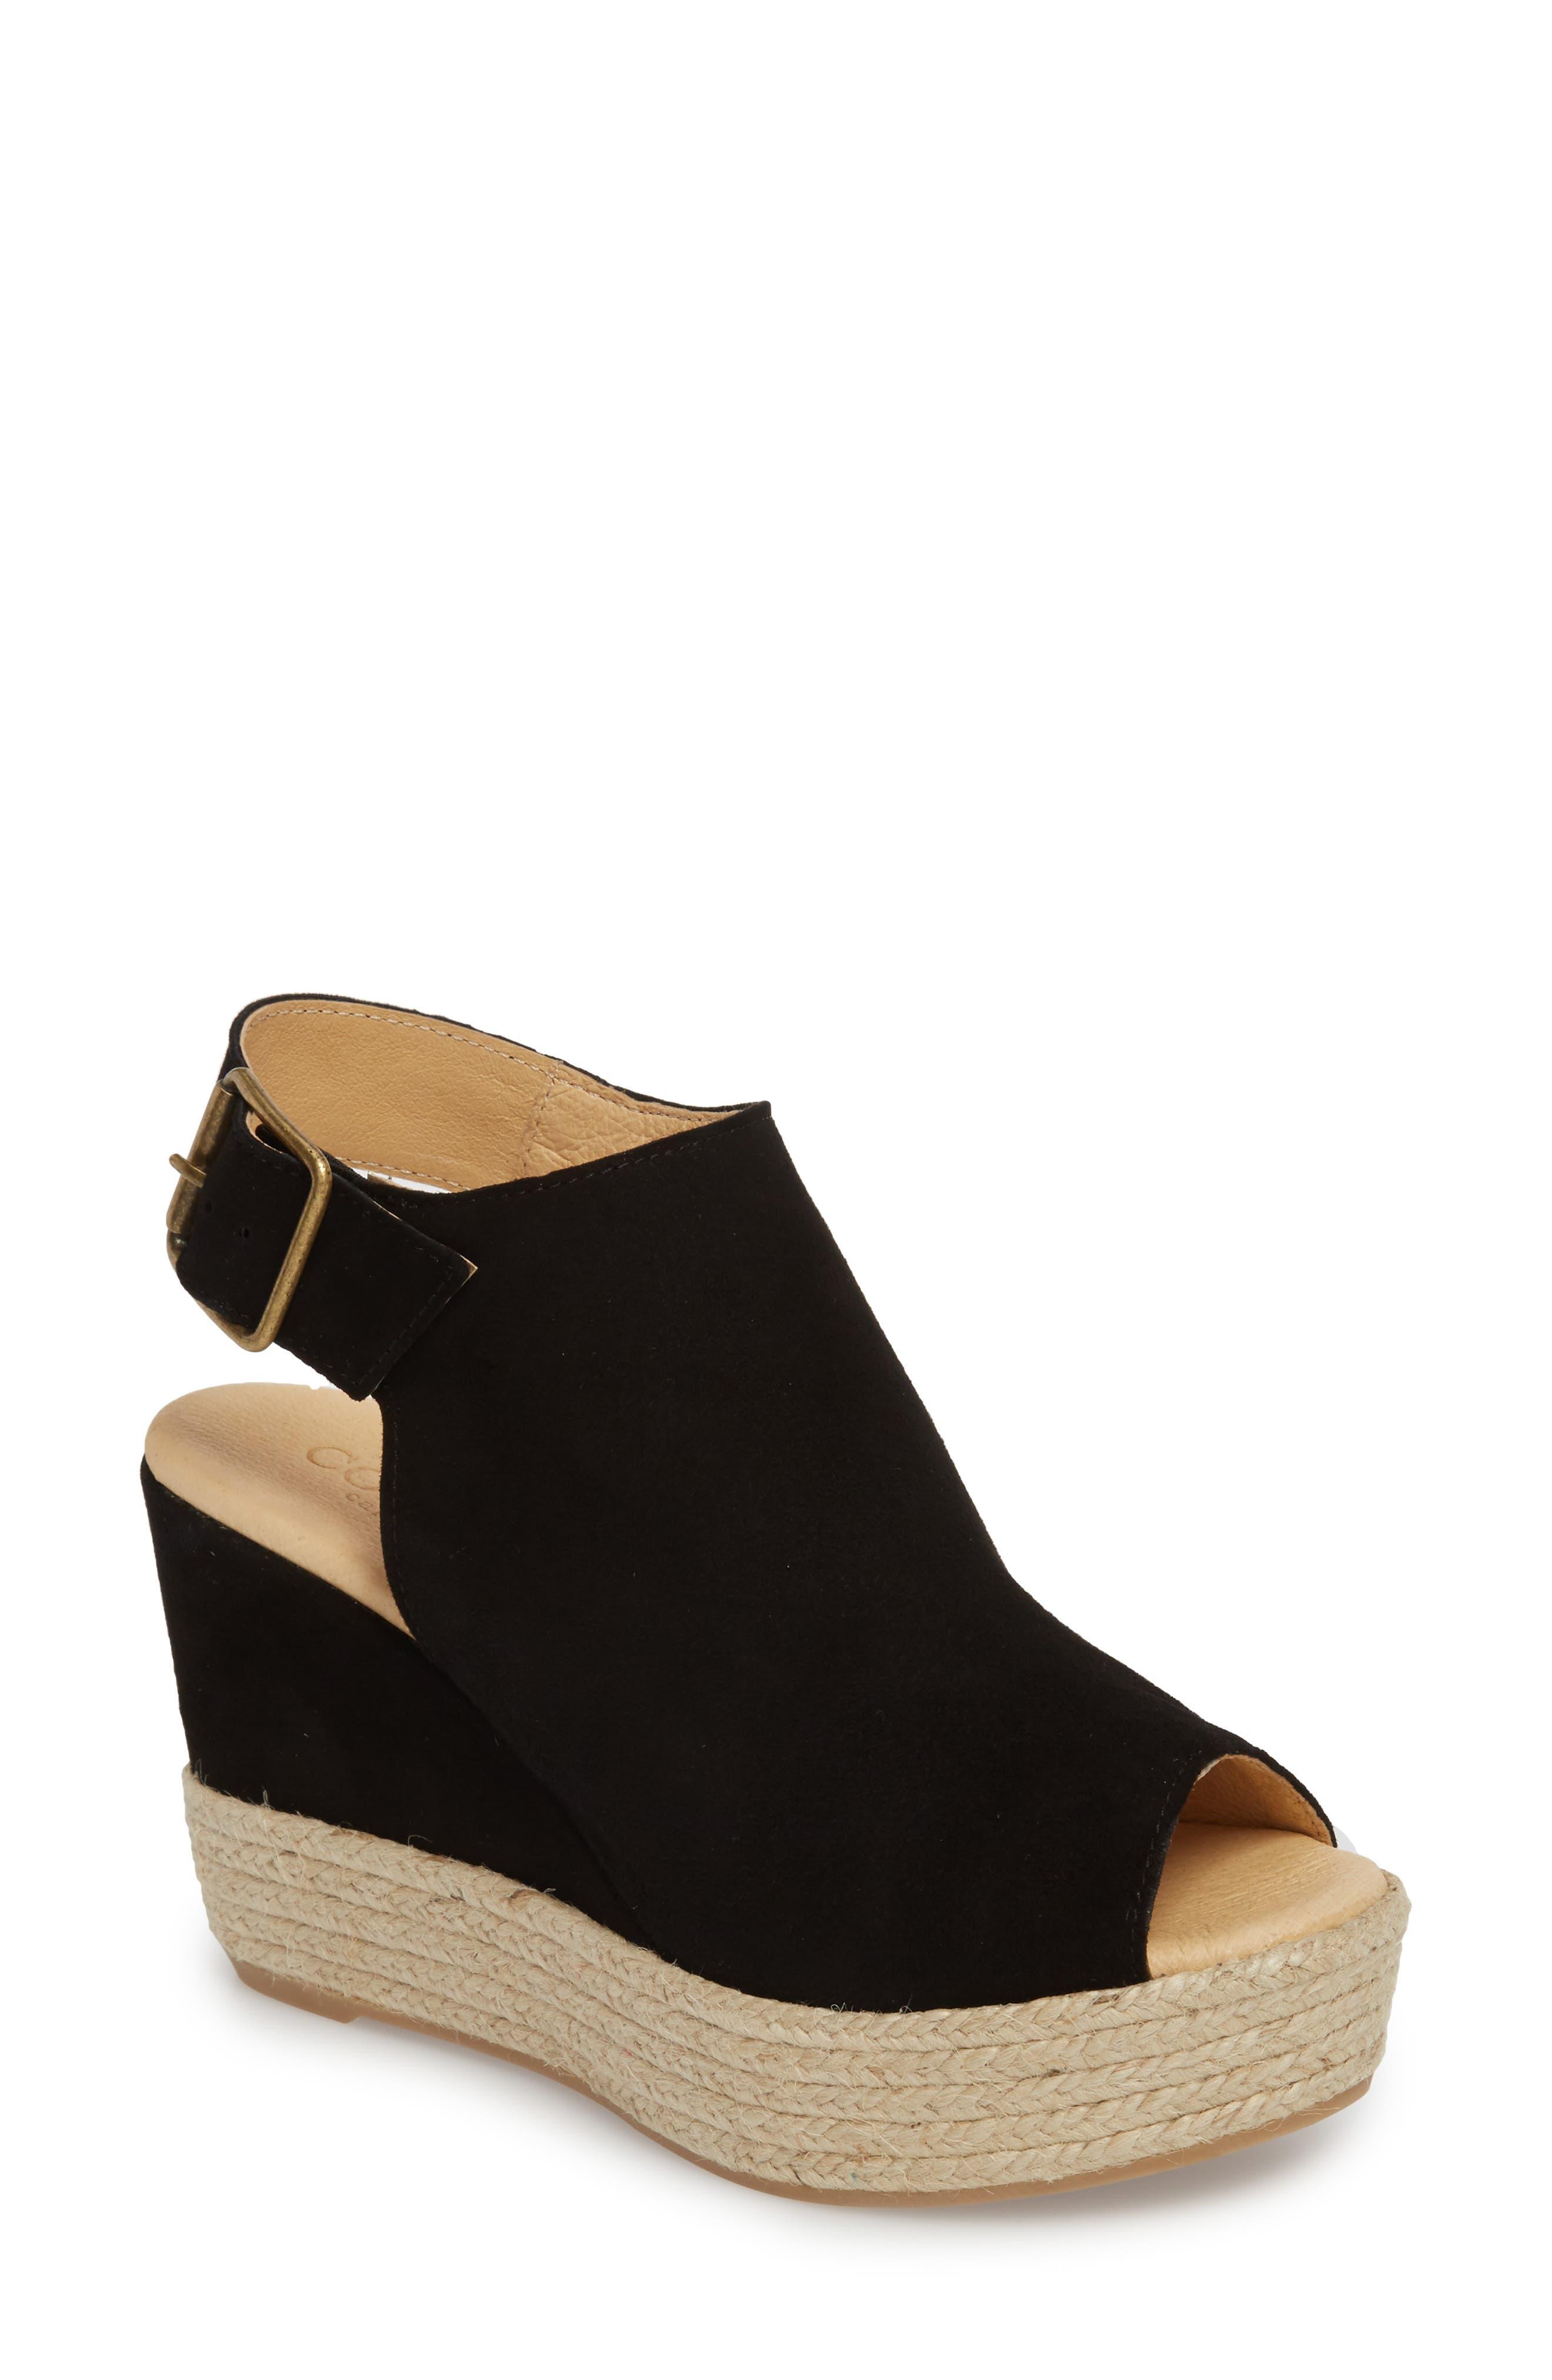 Cordani Elisse Epadrille Wedge Sandal - Black